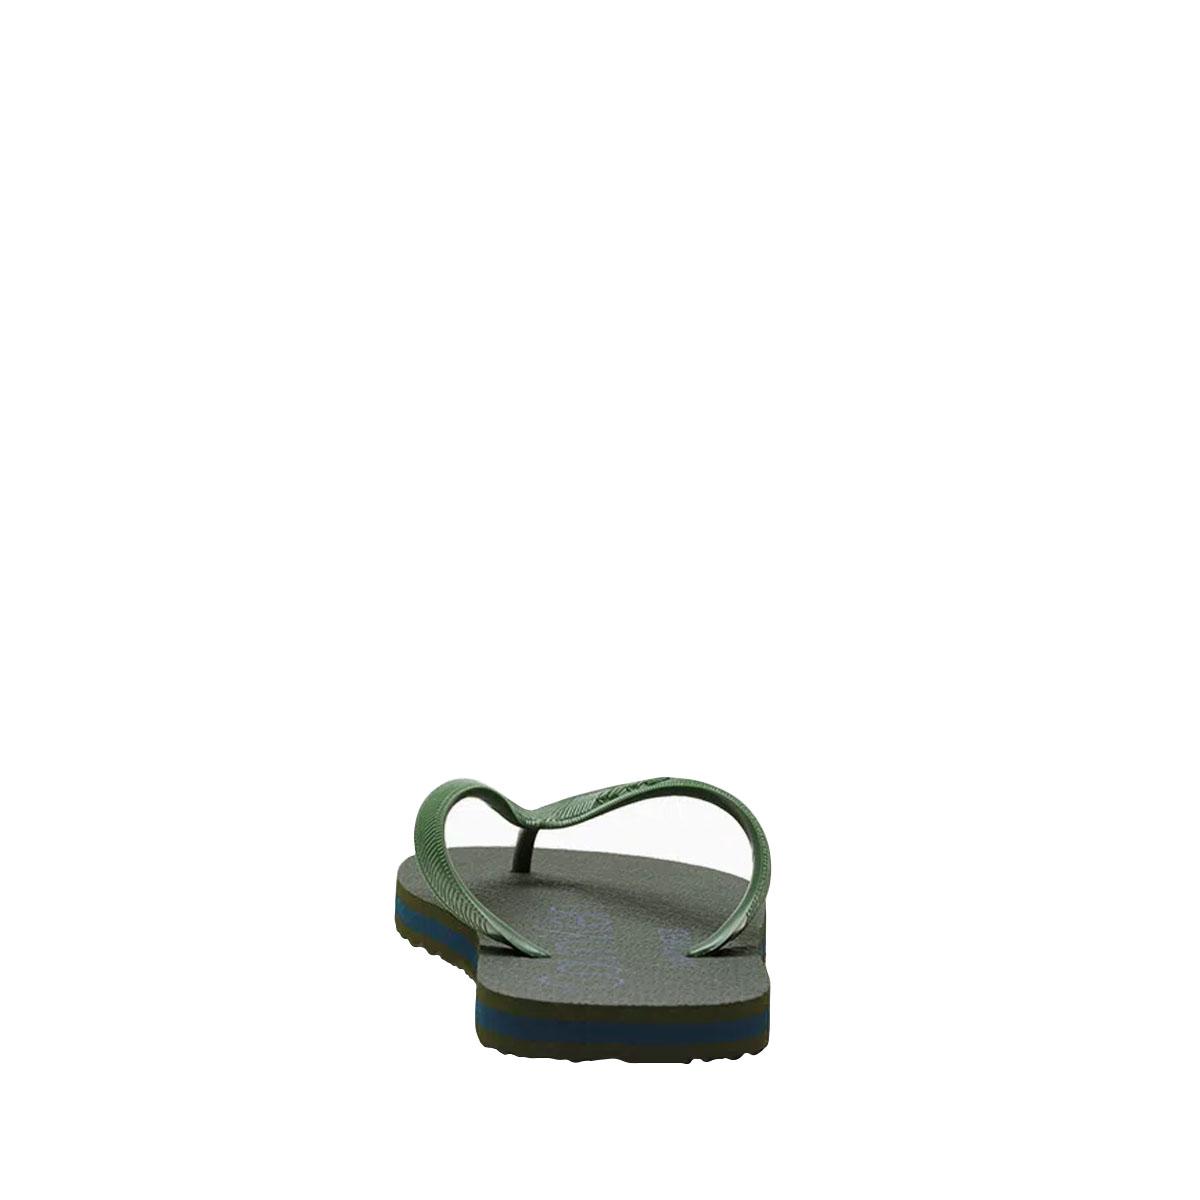 Chinelo Calvin Klein Swimwear Masculino Militar